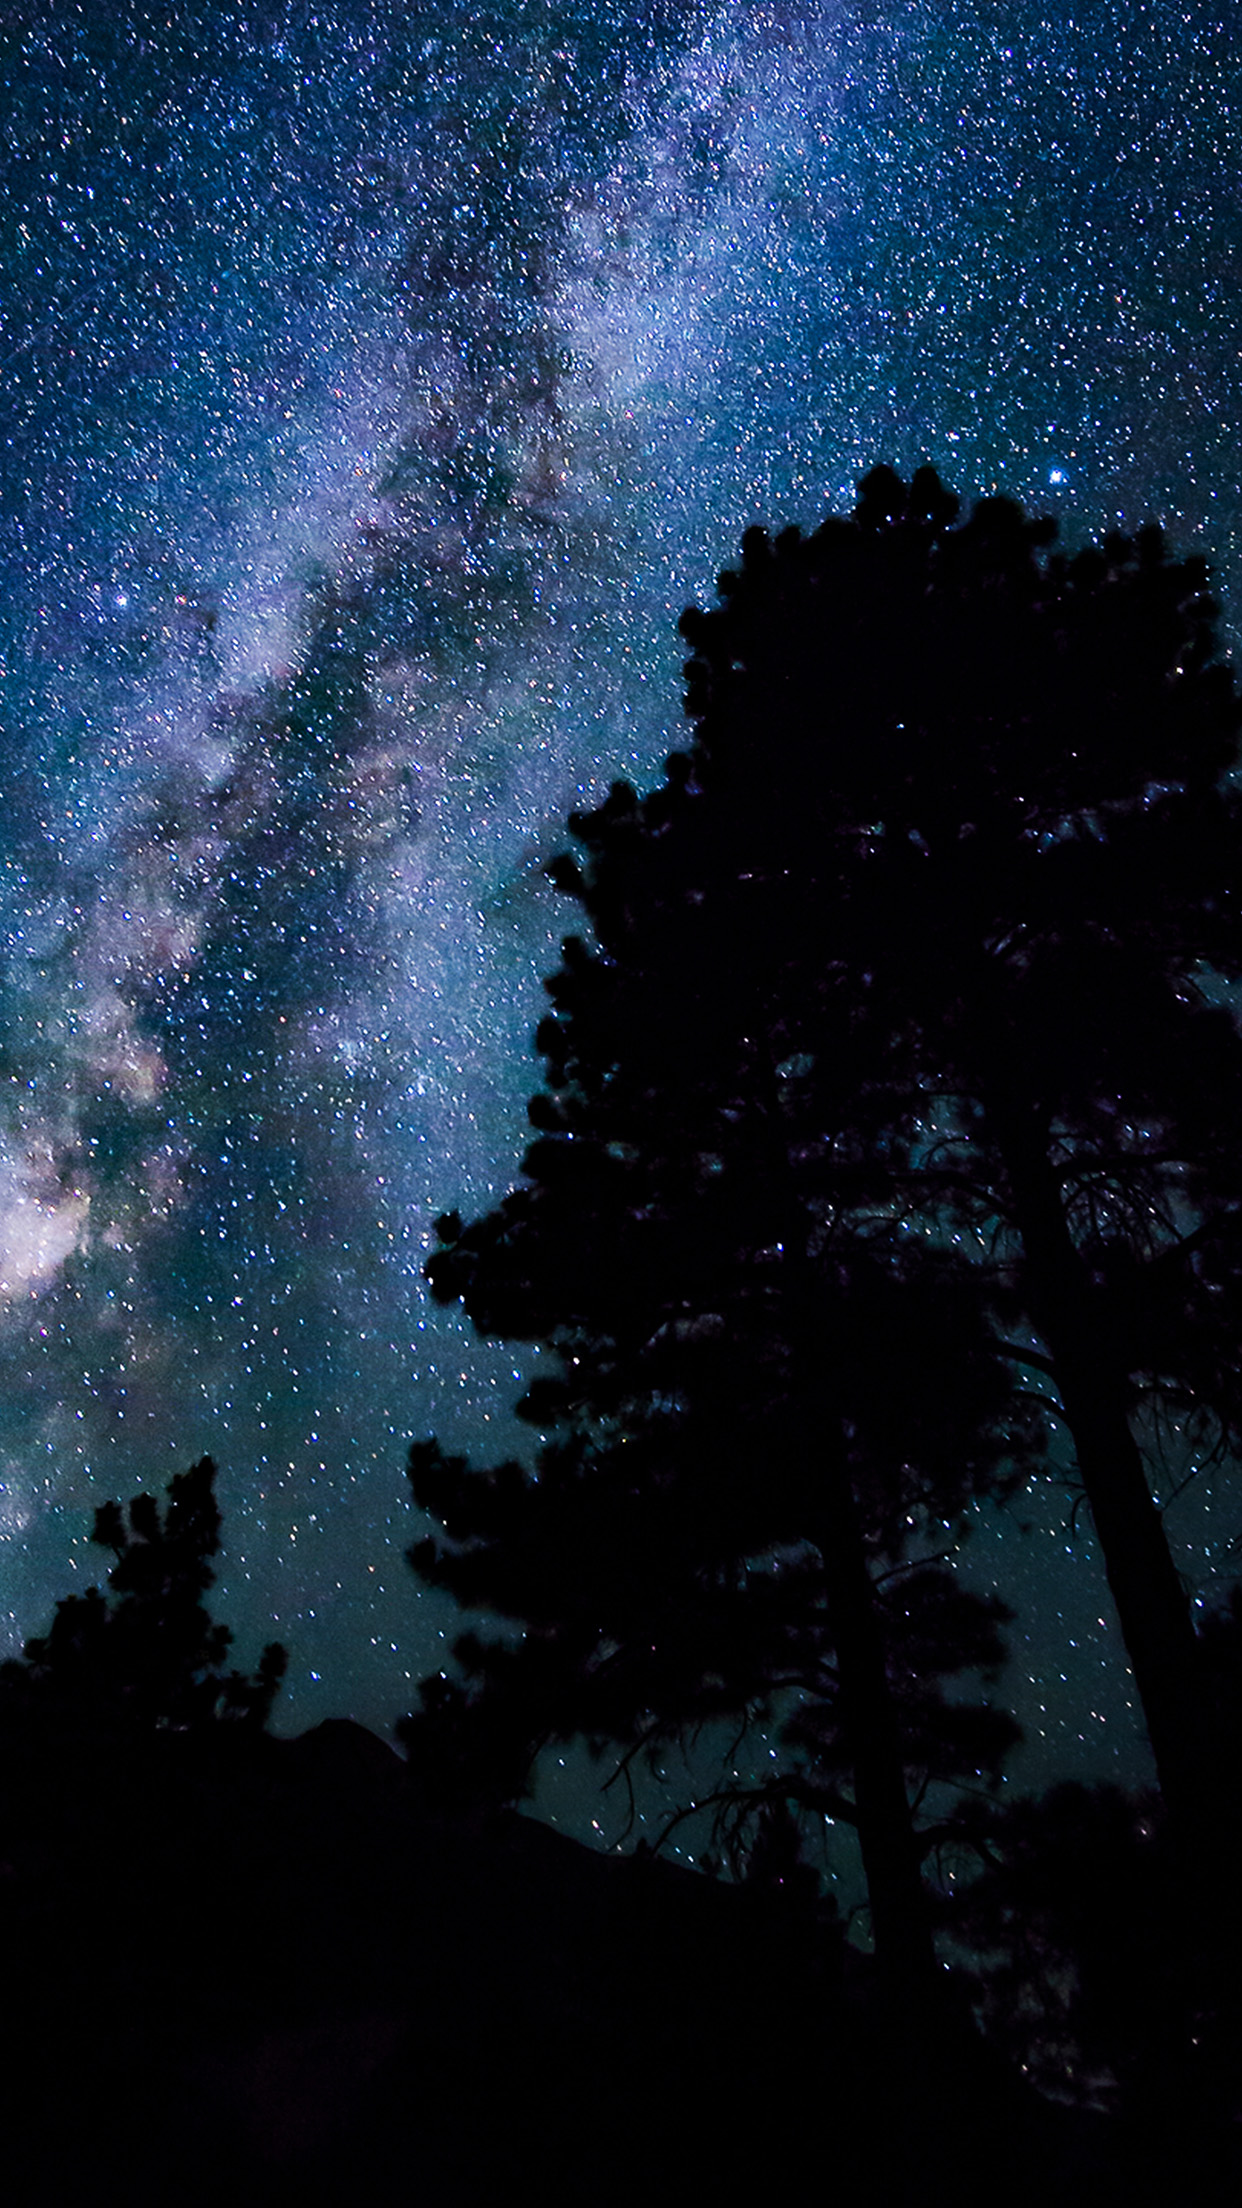 Iphone 6 Plus Fall Wallpaper Papers Co Iphone Wallpaper Nx78 Night Sky Dark Star Nature